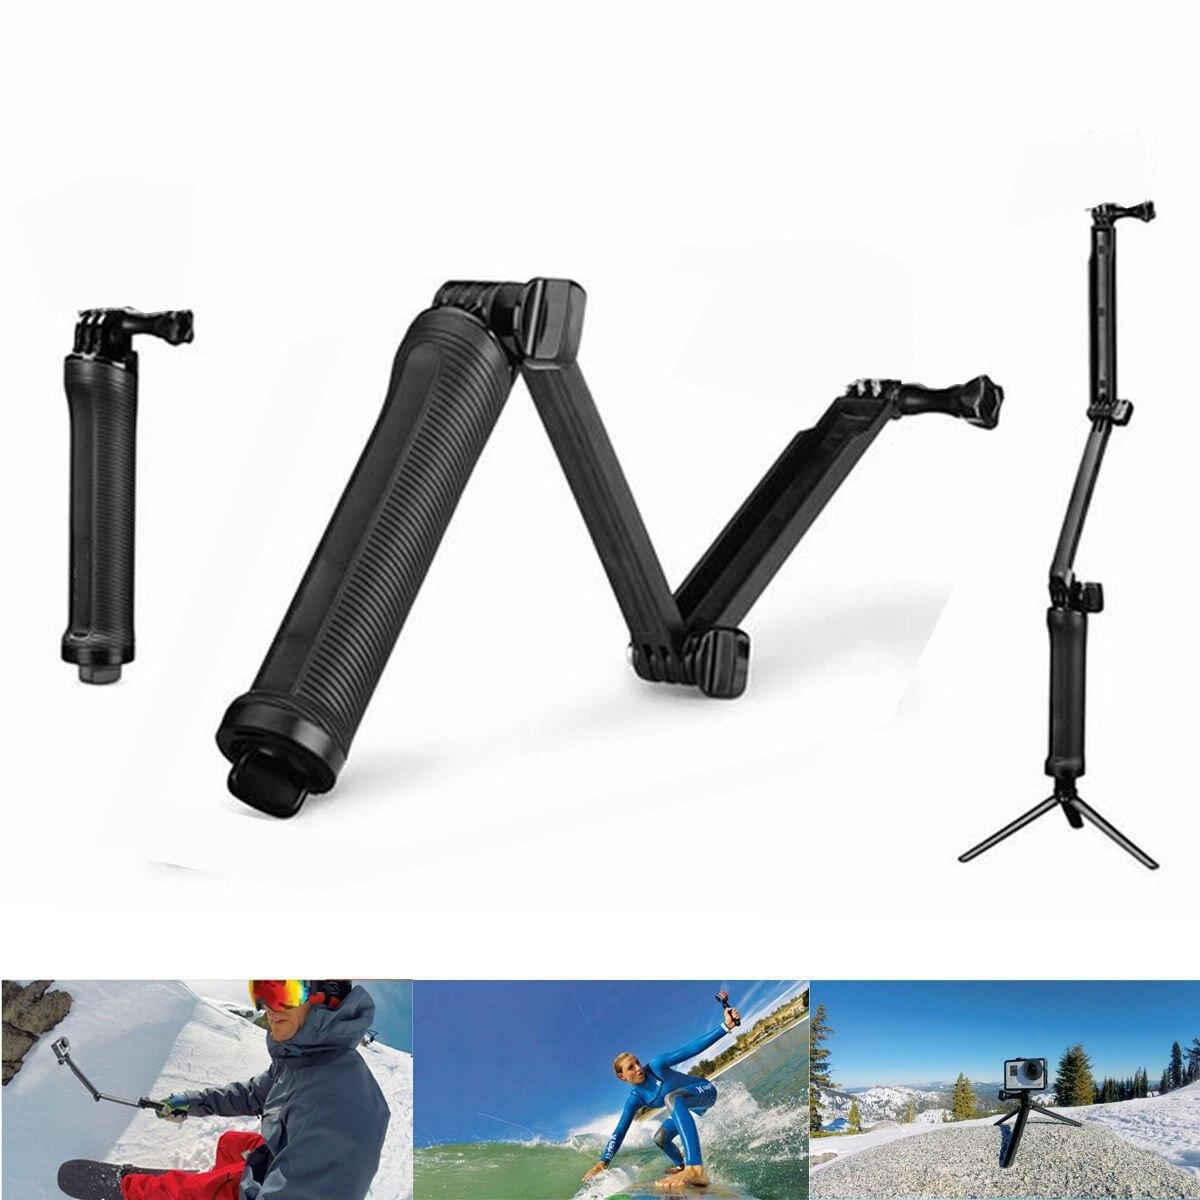 Sport Camera Tripod Folding Three-way Adjusting Arm Three-folding Selfie Stick GoPro Accessories Sports Camera Bracket 3-way